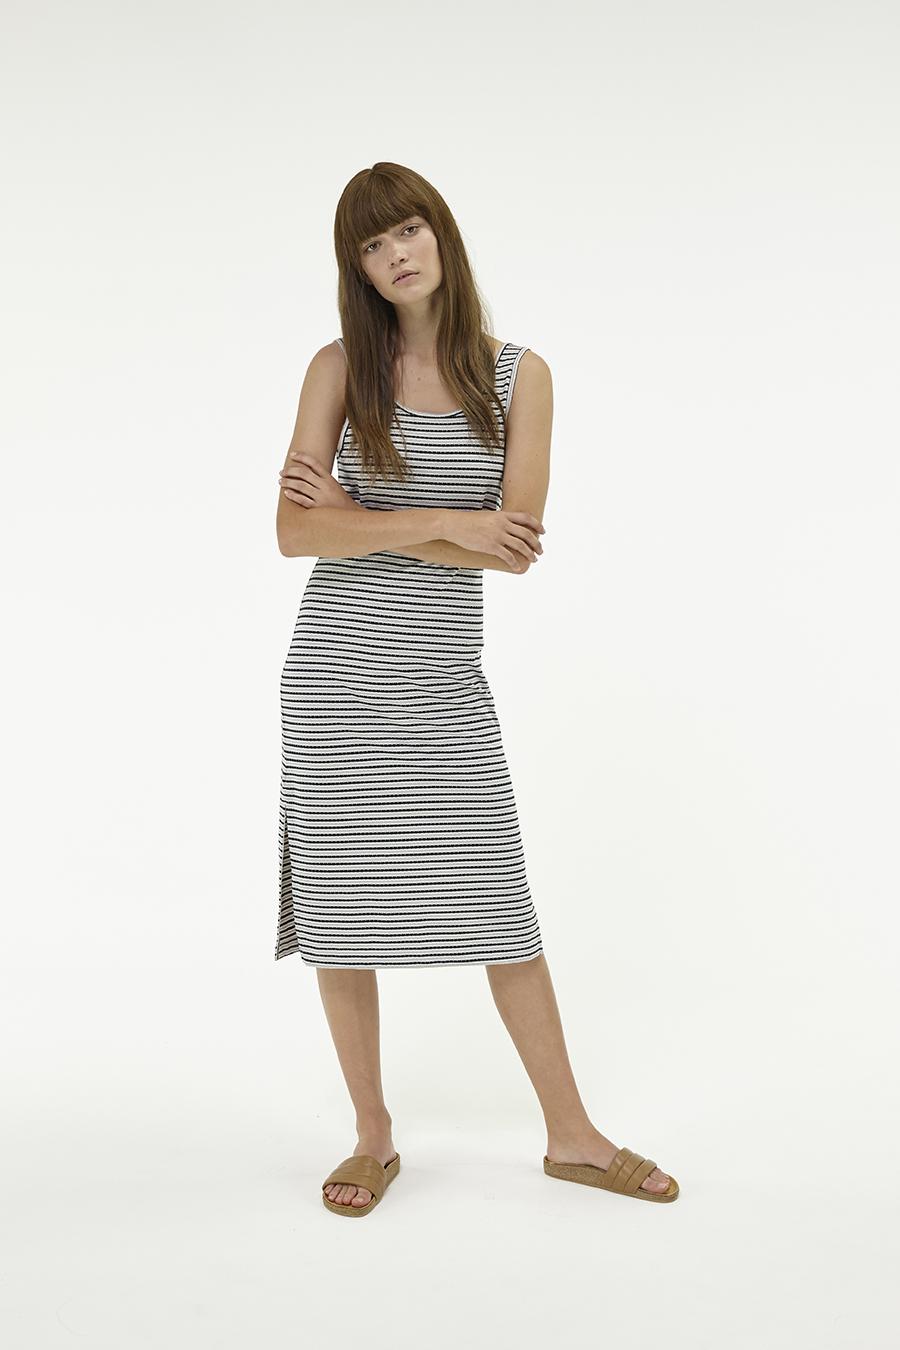 Huffer_Q3-16_W-Railway-Plaza-Dress_Black-Grey-04